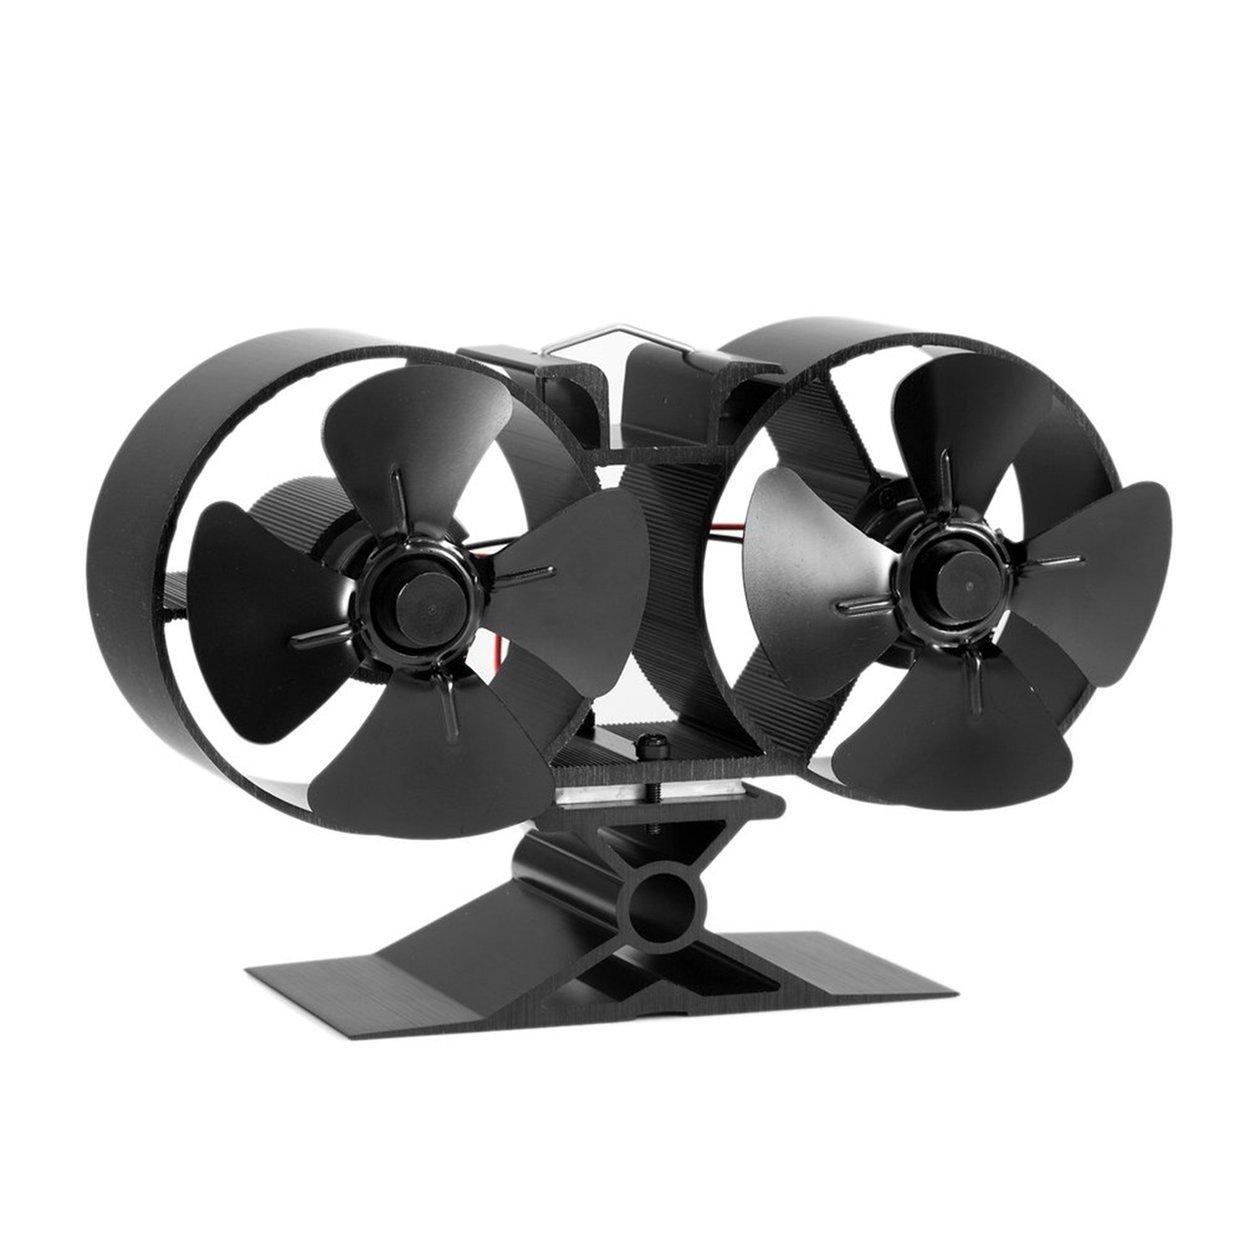 Dailyinshop 4 Blades Doppelwärme PoweROT Herd Fans F260 Startseite Kraftstoff Energiesparherd Fan